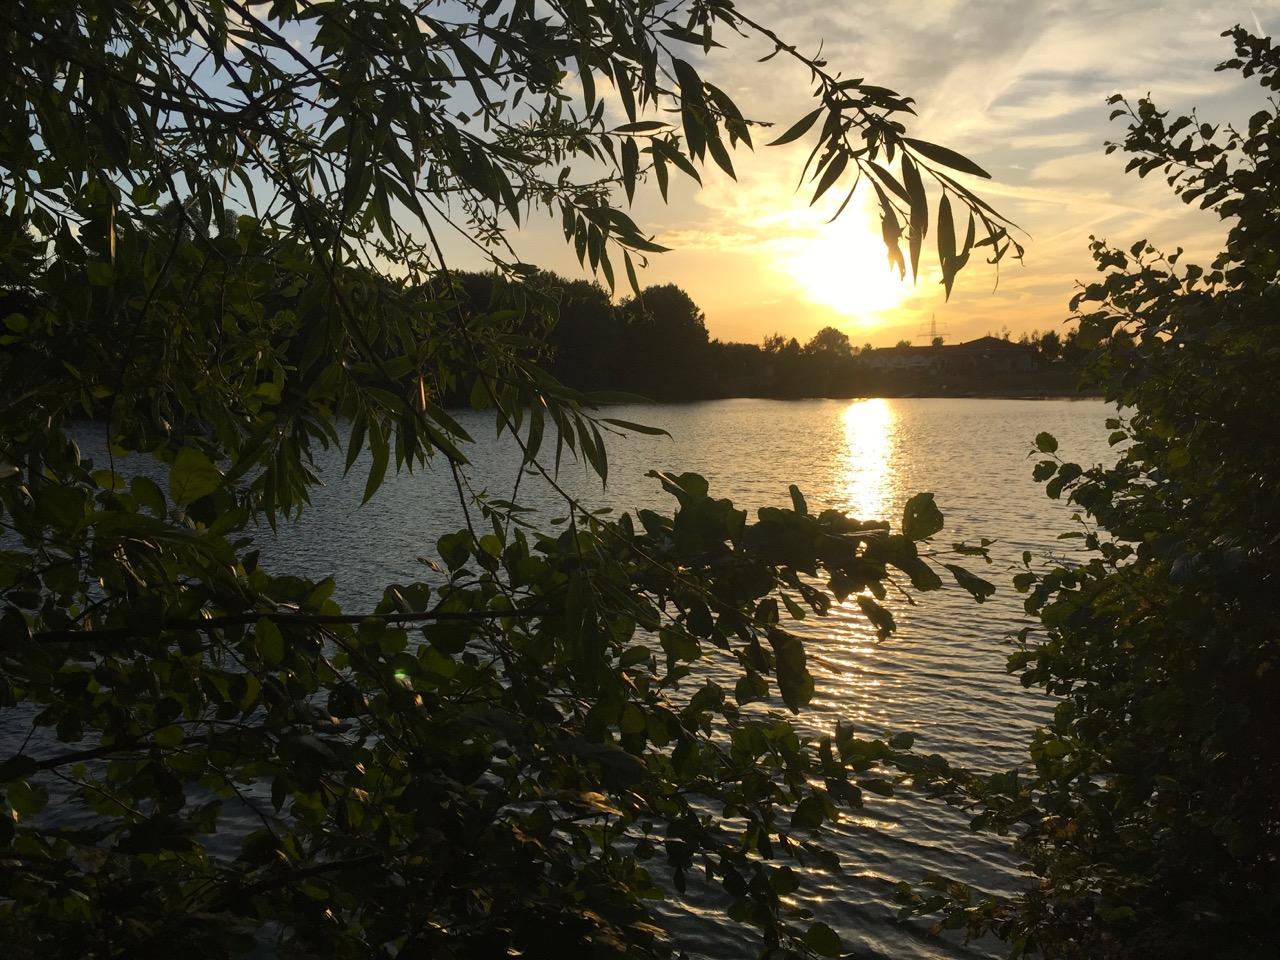 Sonnenuntergang Seehotel Niedernberg Dorf am See